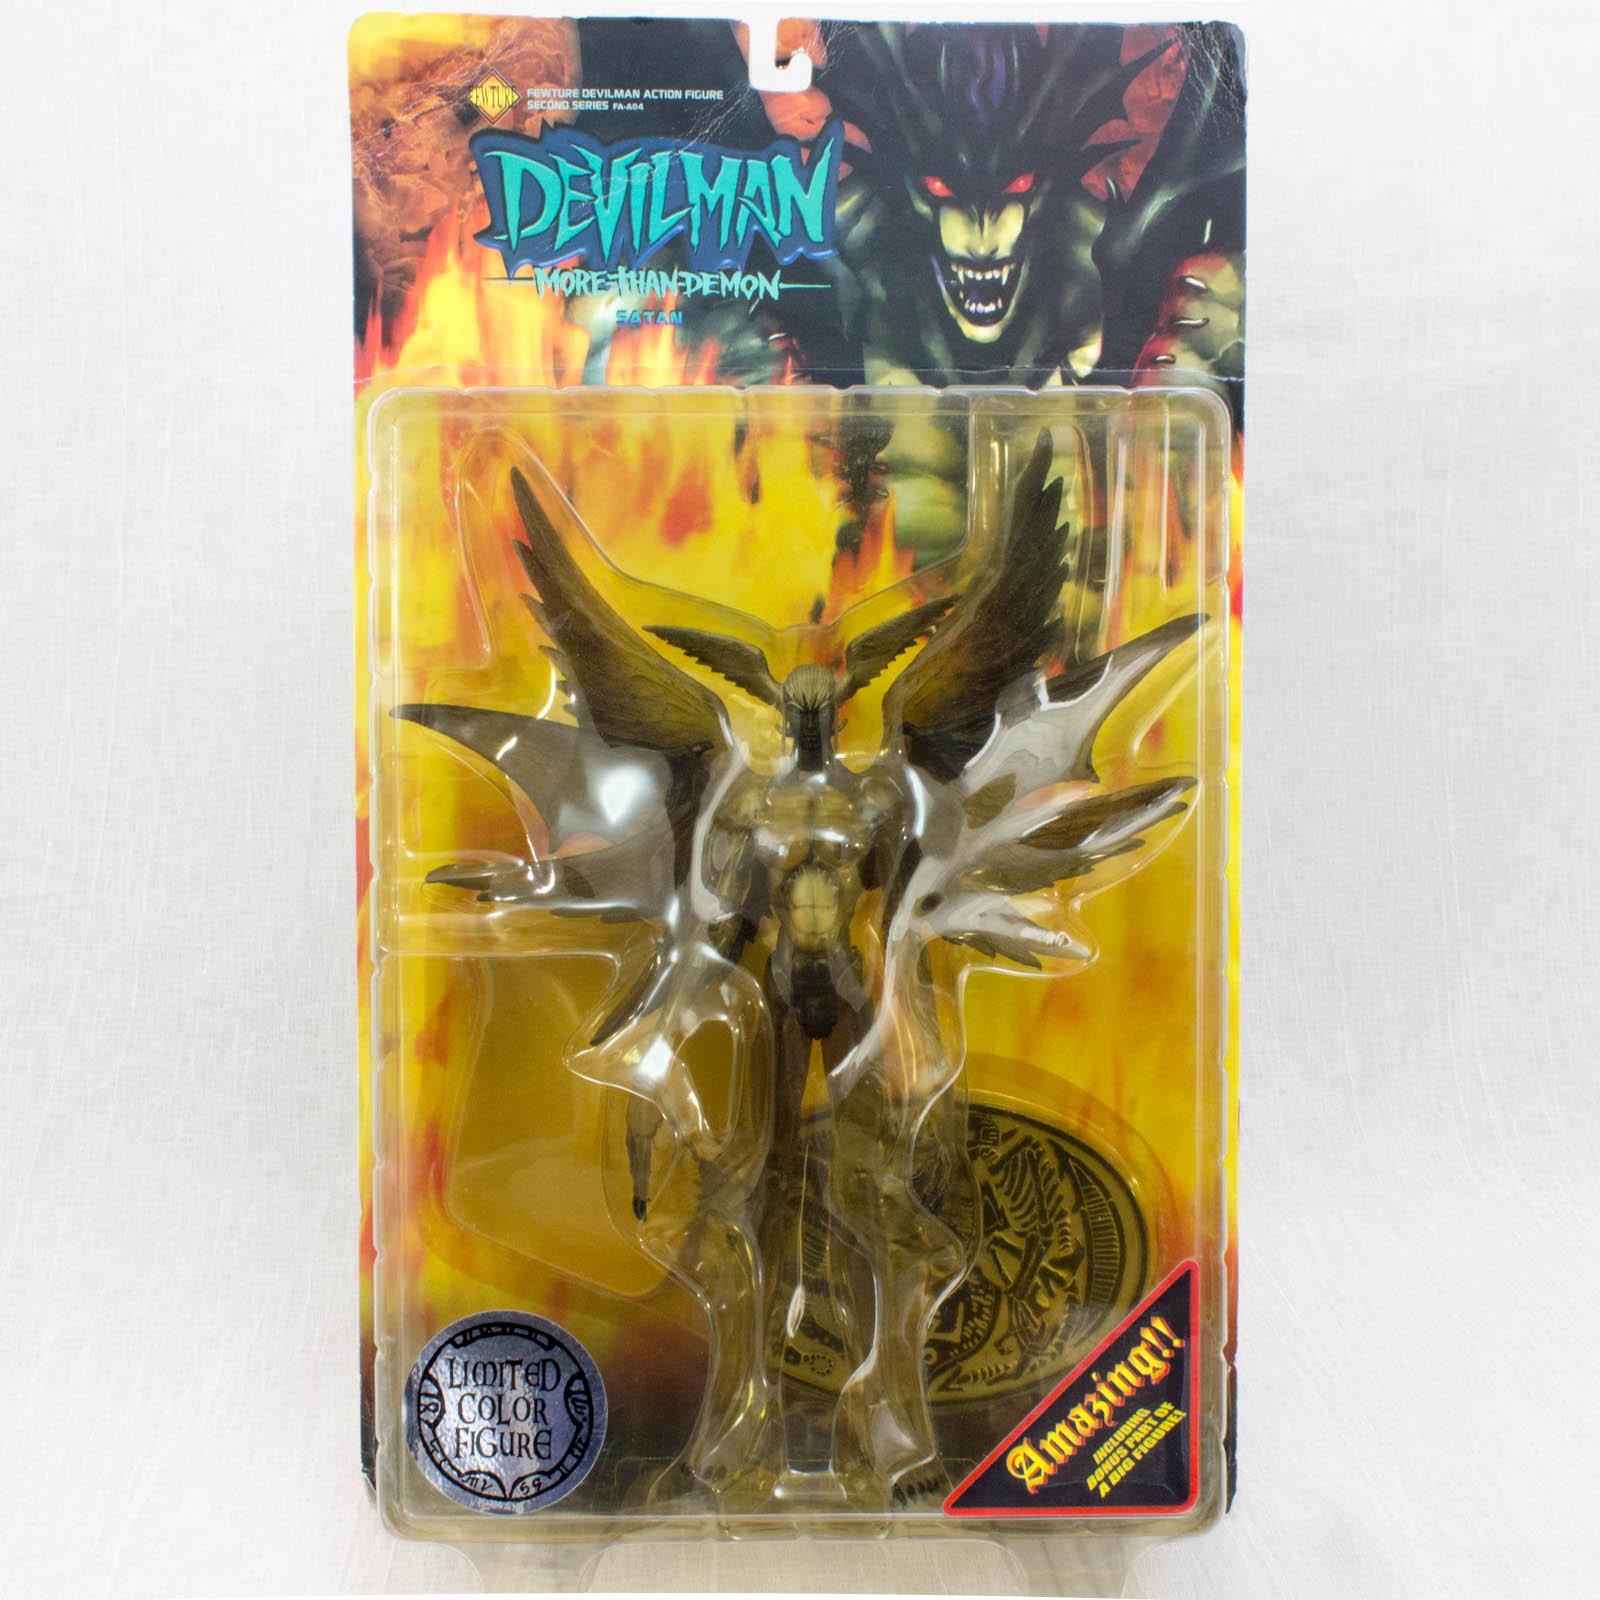 Devilman Satan Limited Color Action Figure Fewture Nagai Go JAPAN ANIME MANGA